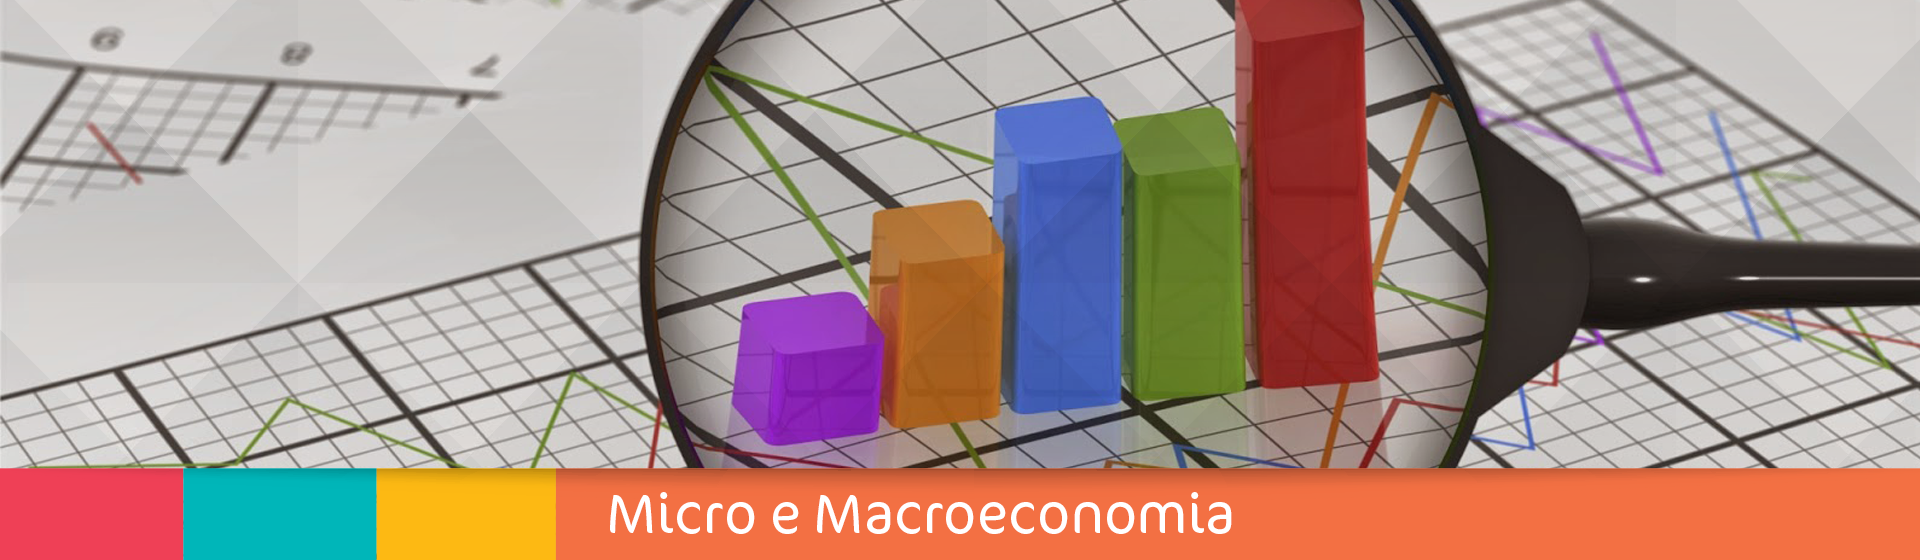 Micro macroeconomia maior